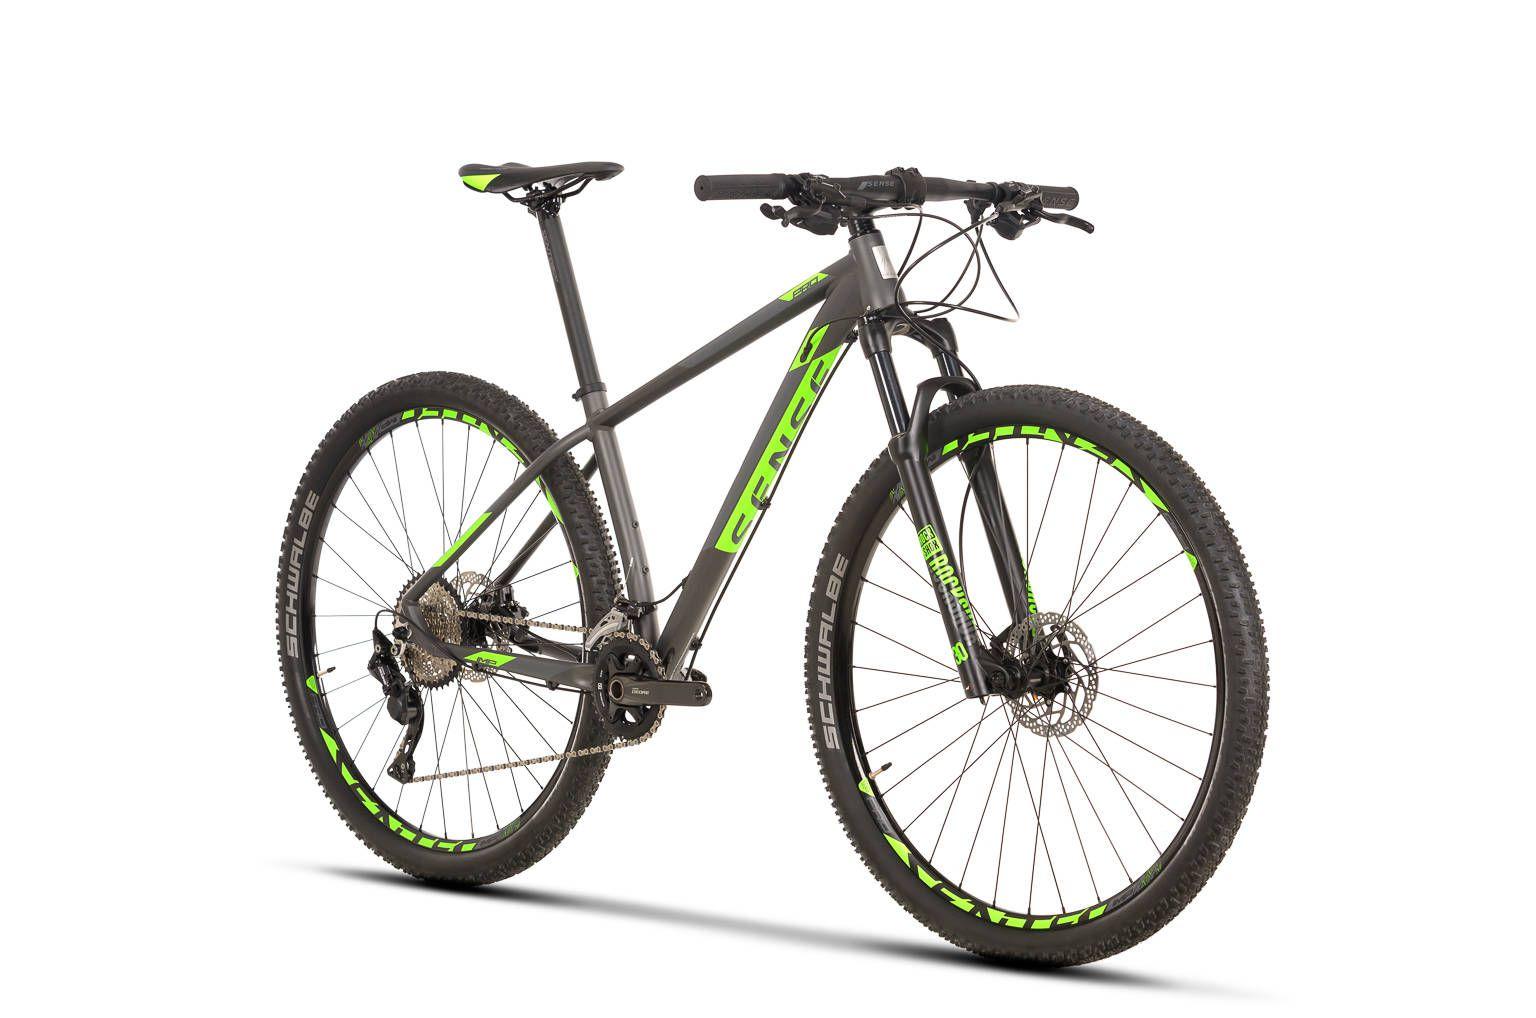 Bicicleta SENSE Impact Pro 2020 - 20v Shimano Deore - Verde Neon/Chumbo